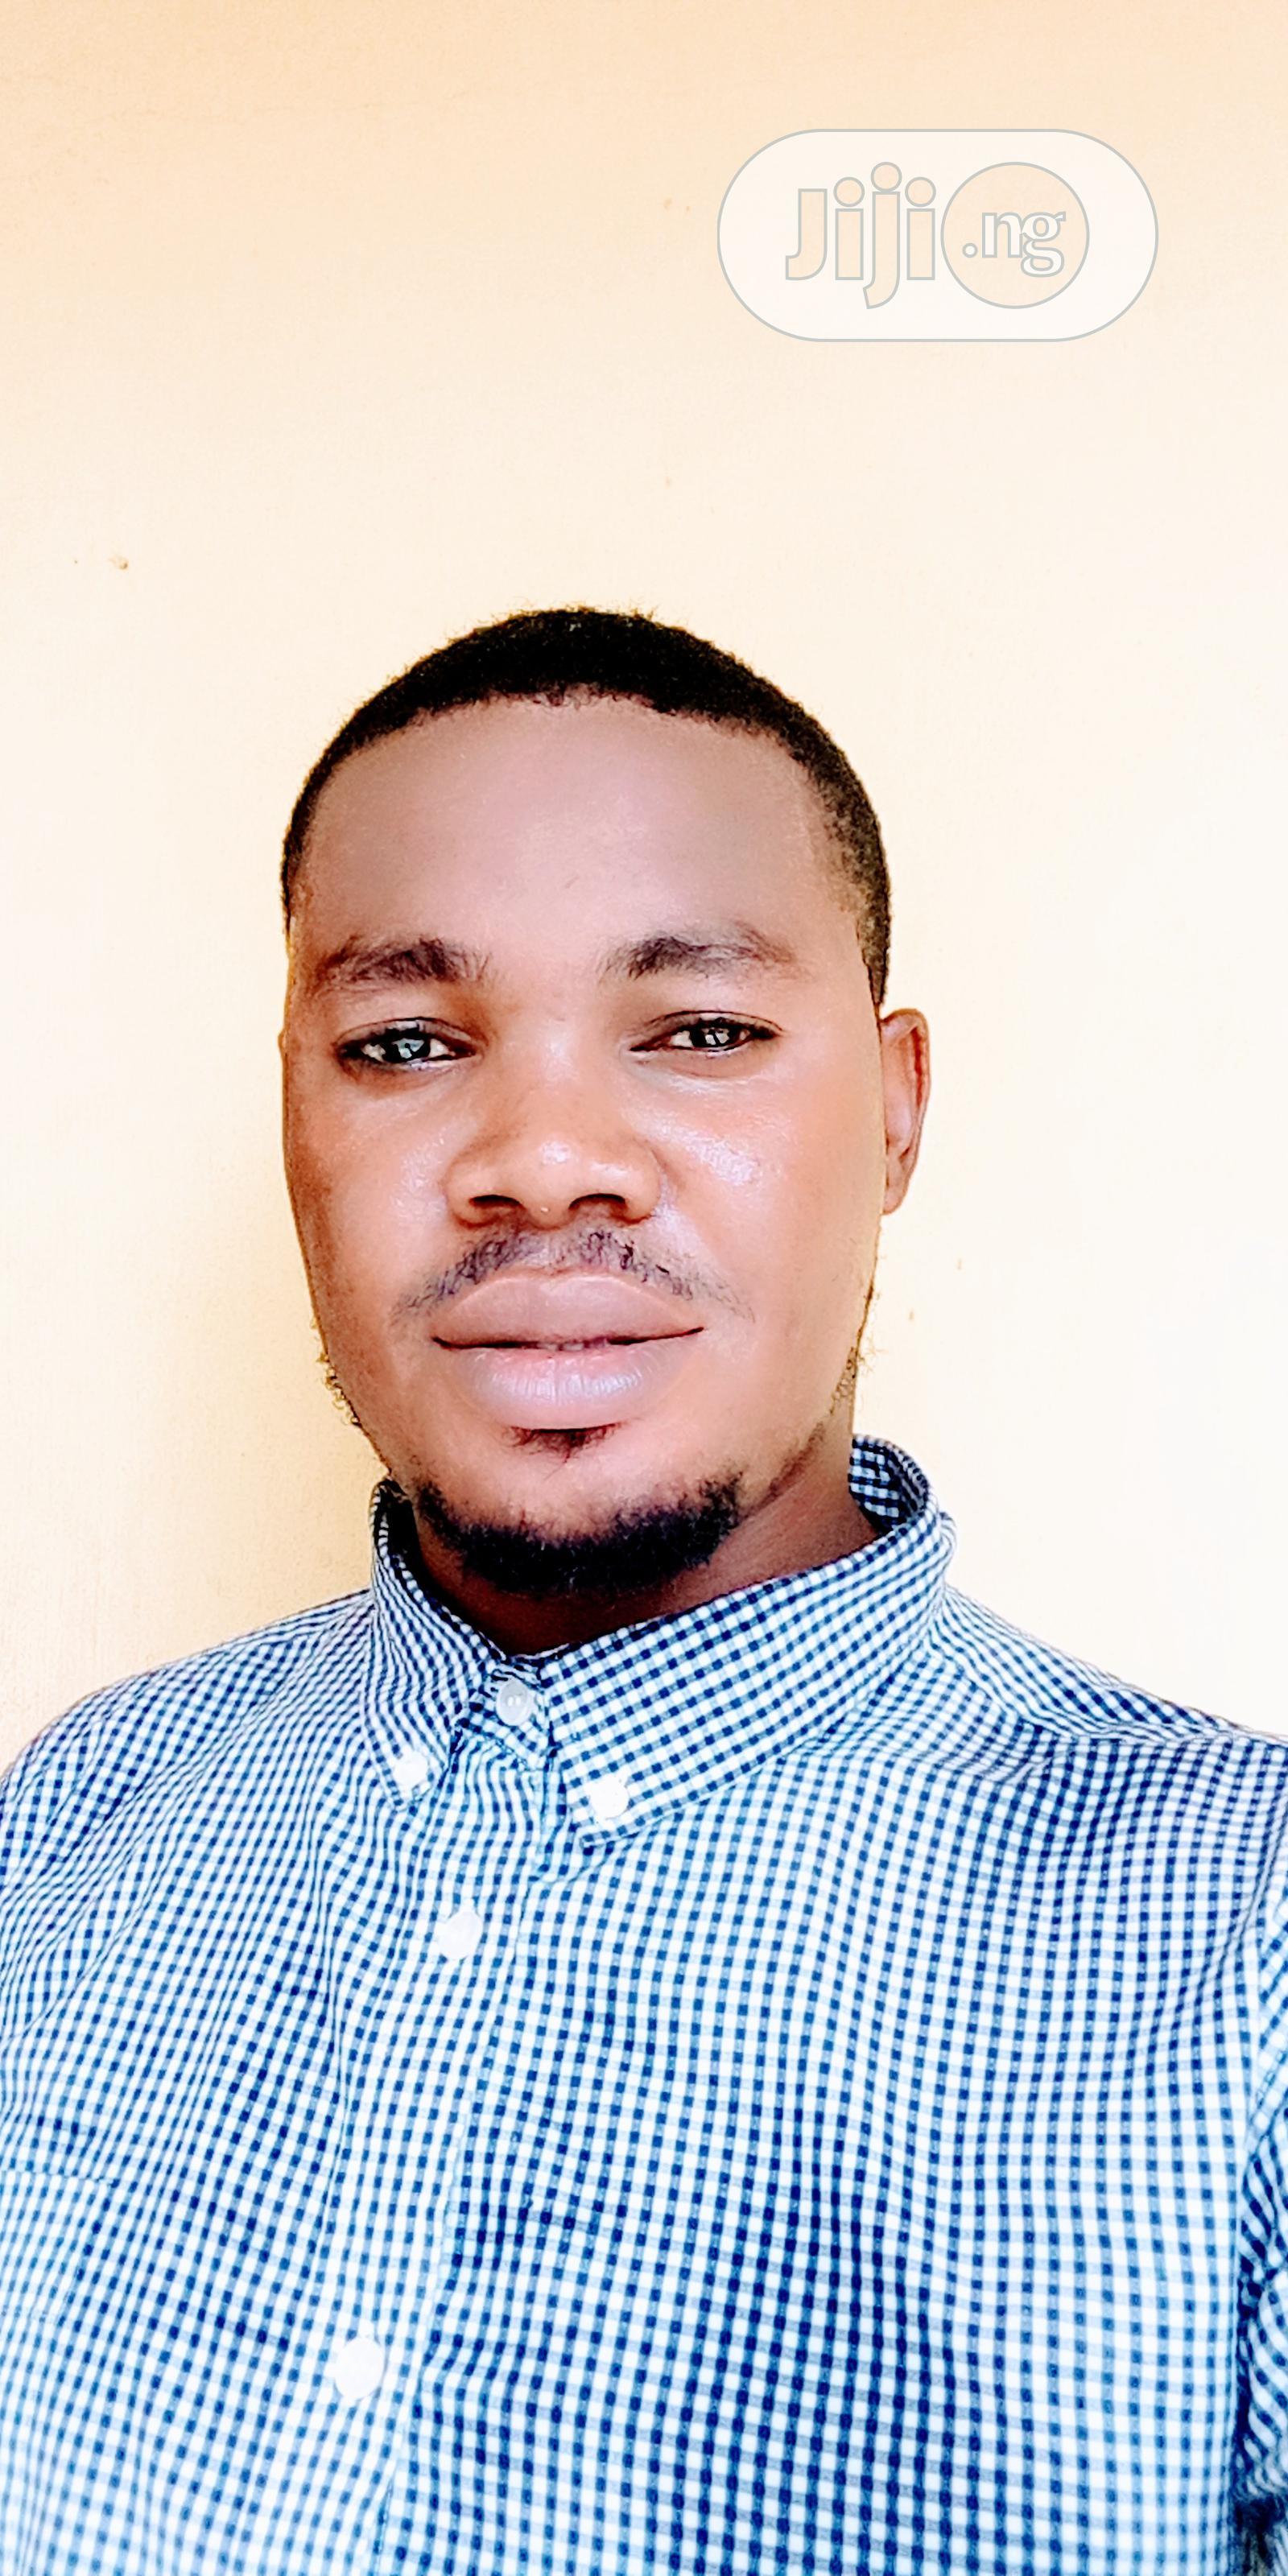 Arts Entertainment CV | Arts & Entertainment CVs for sale in Benin City, Edo State, Nigeria